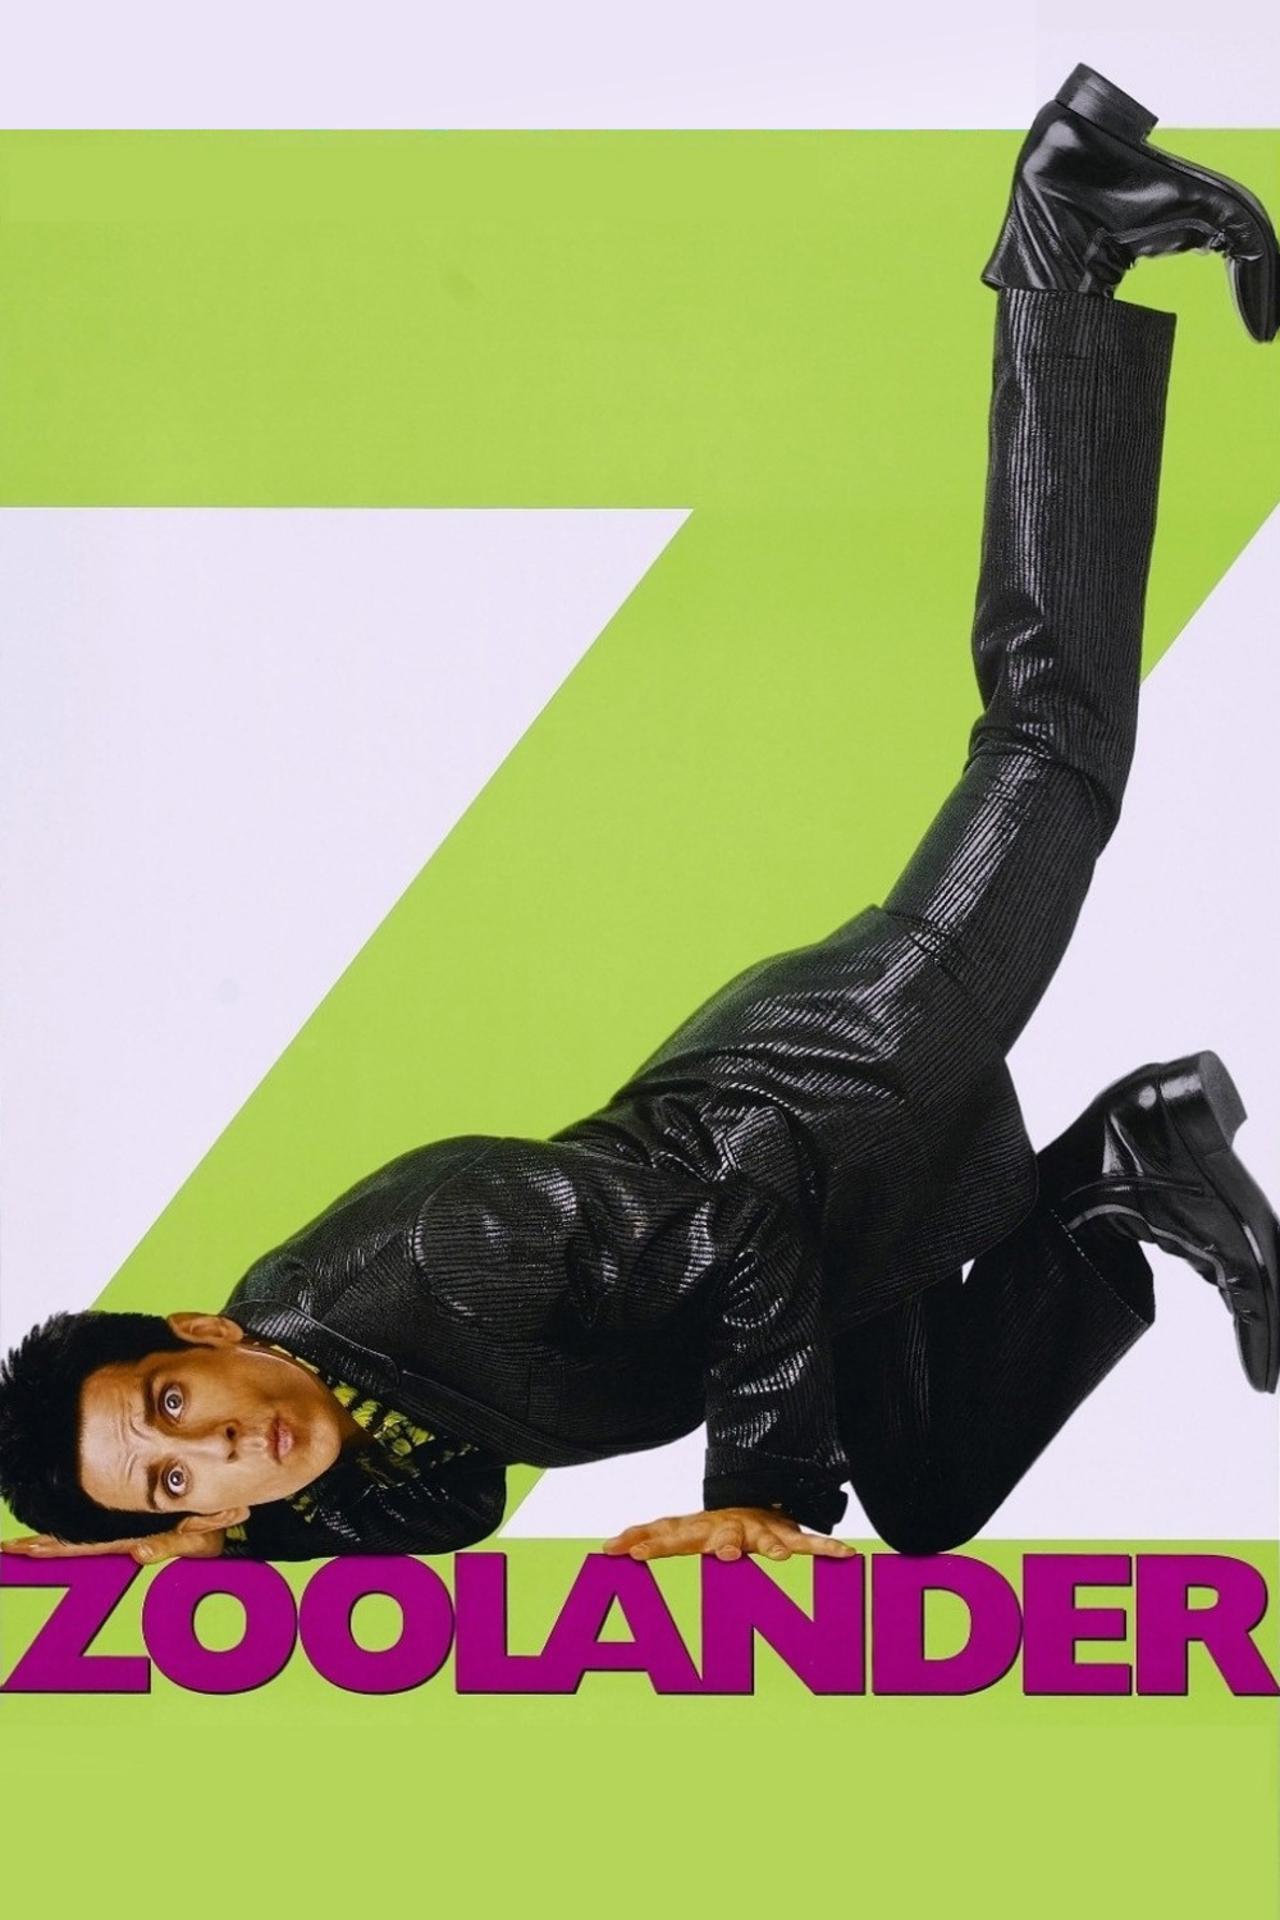 Poster for Zoolander